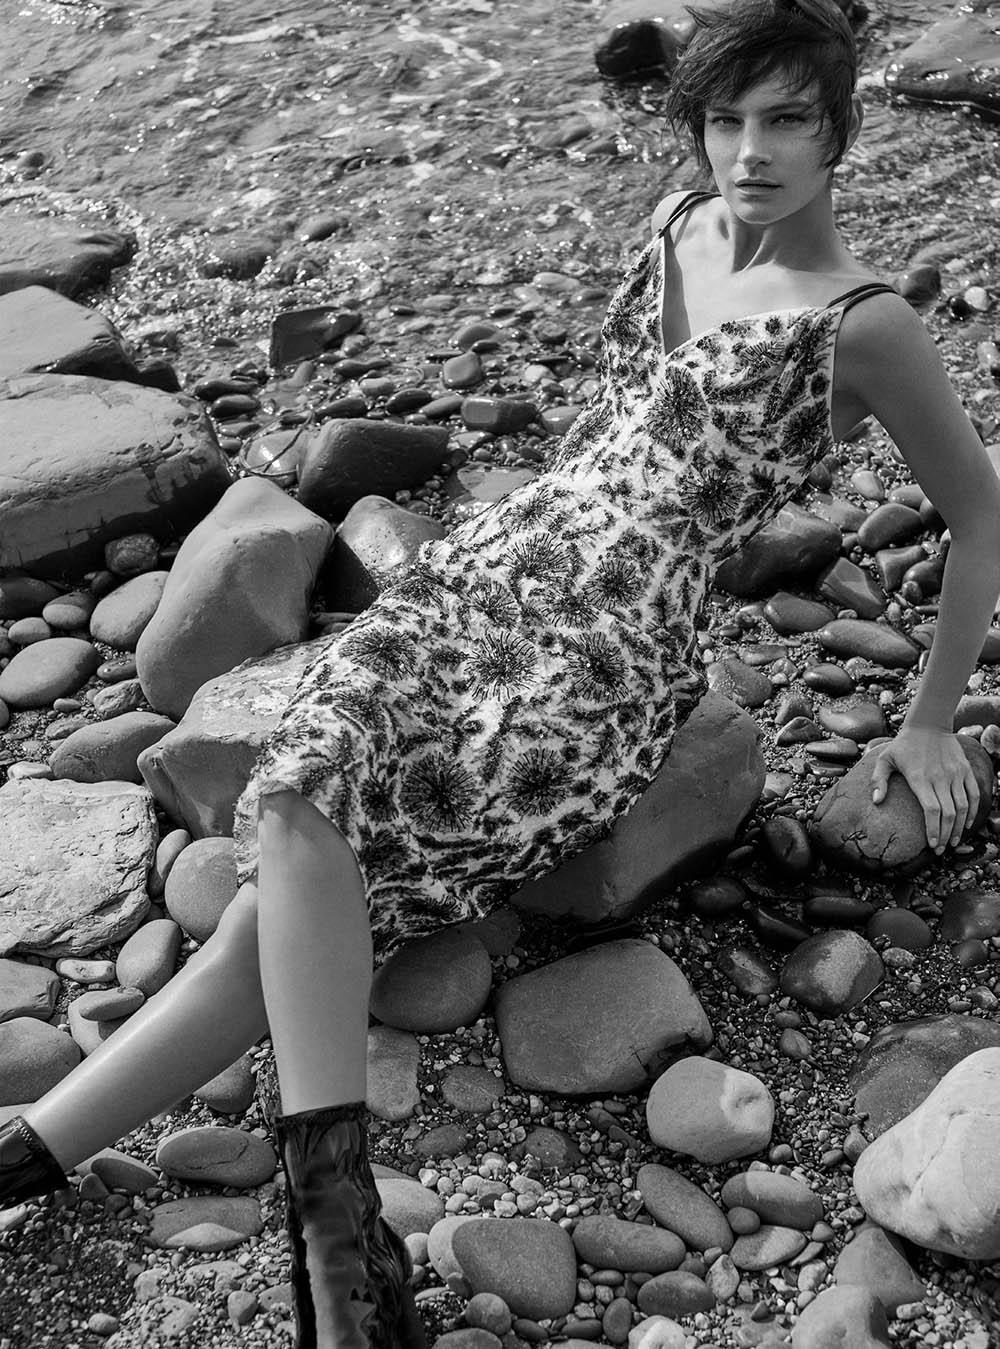 Hirschy Grace by Agata Pospieszynska for Harper's Bazaar UK December 2020